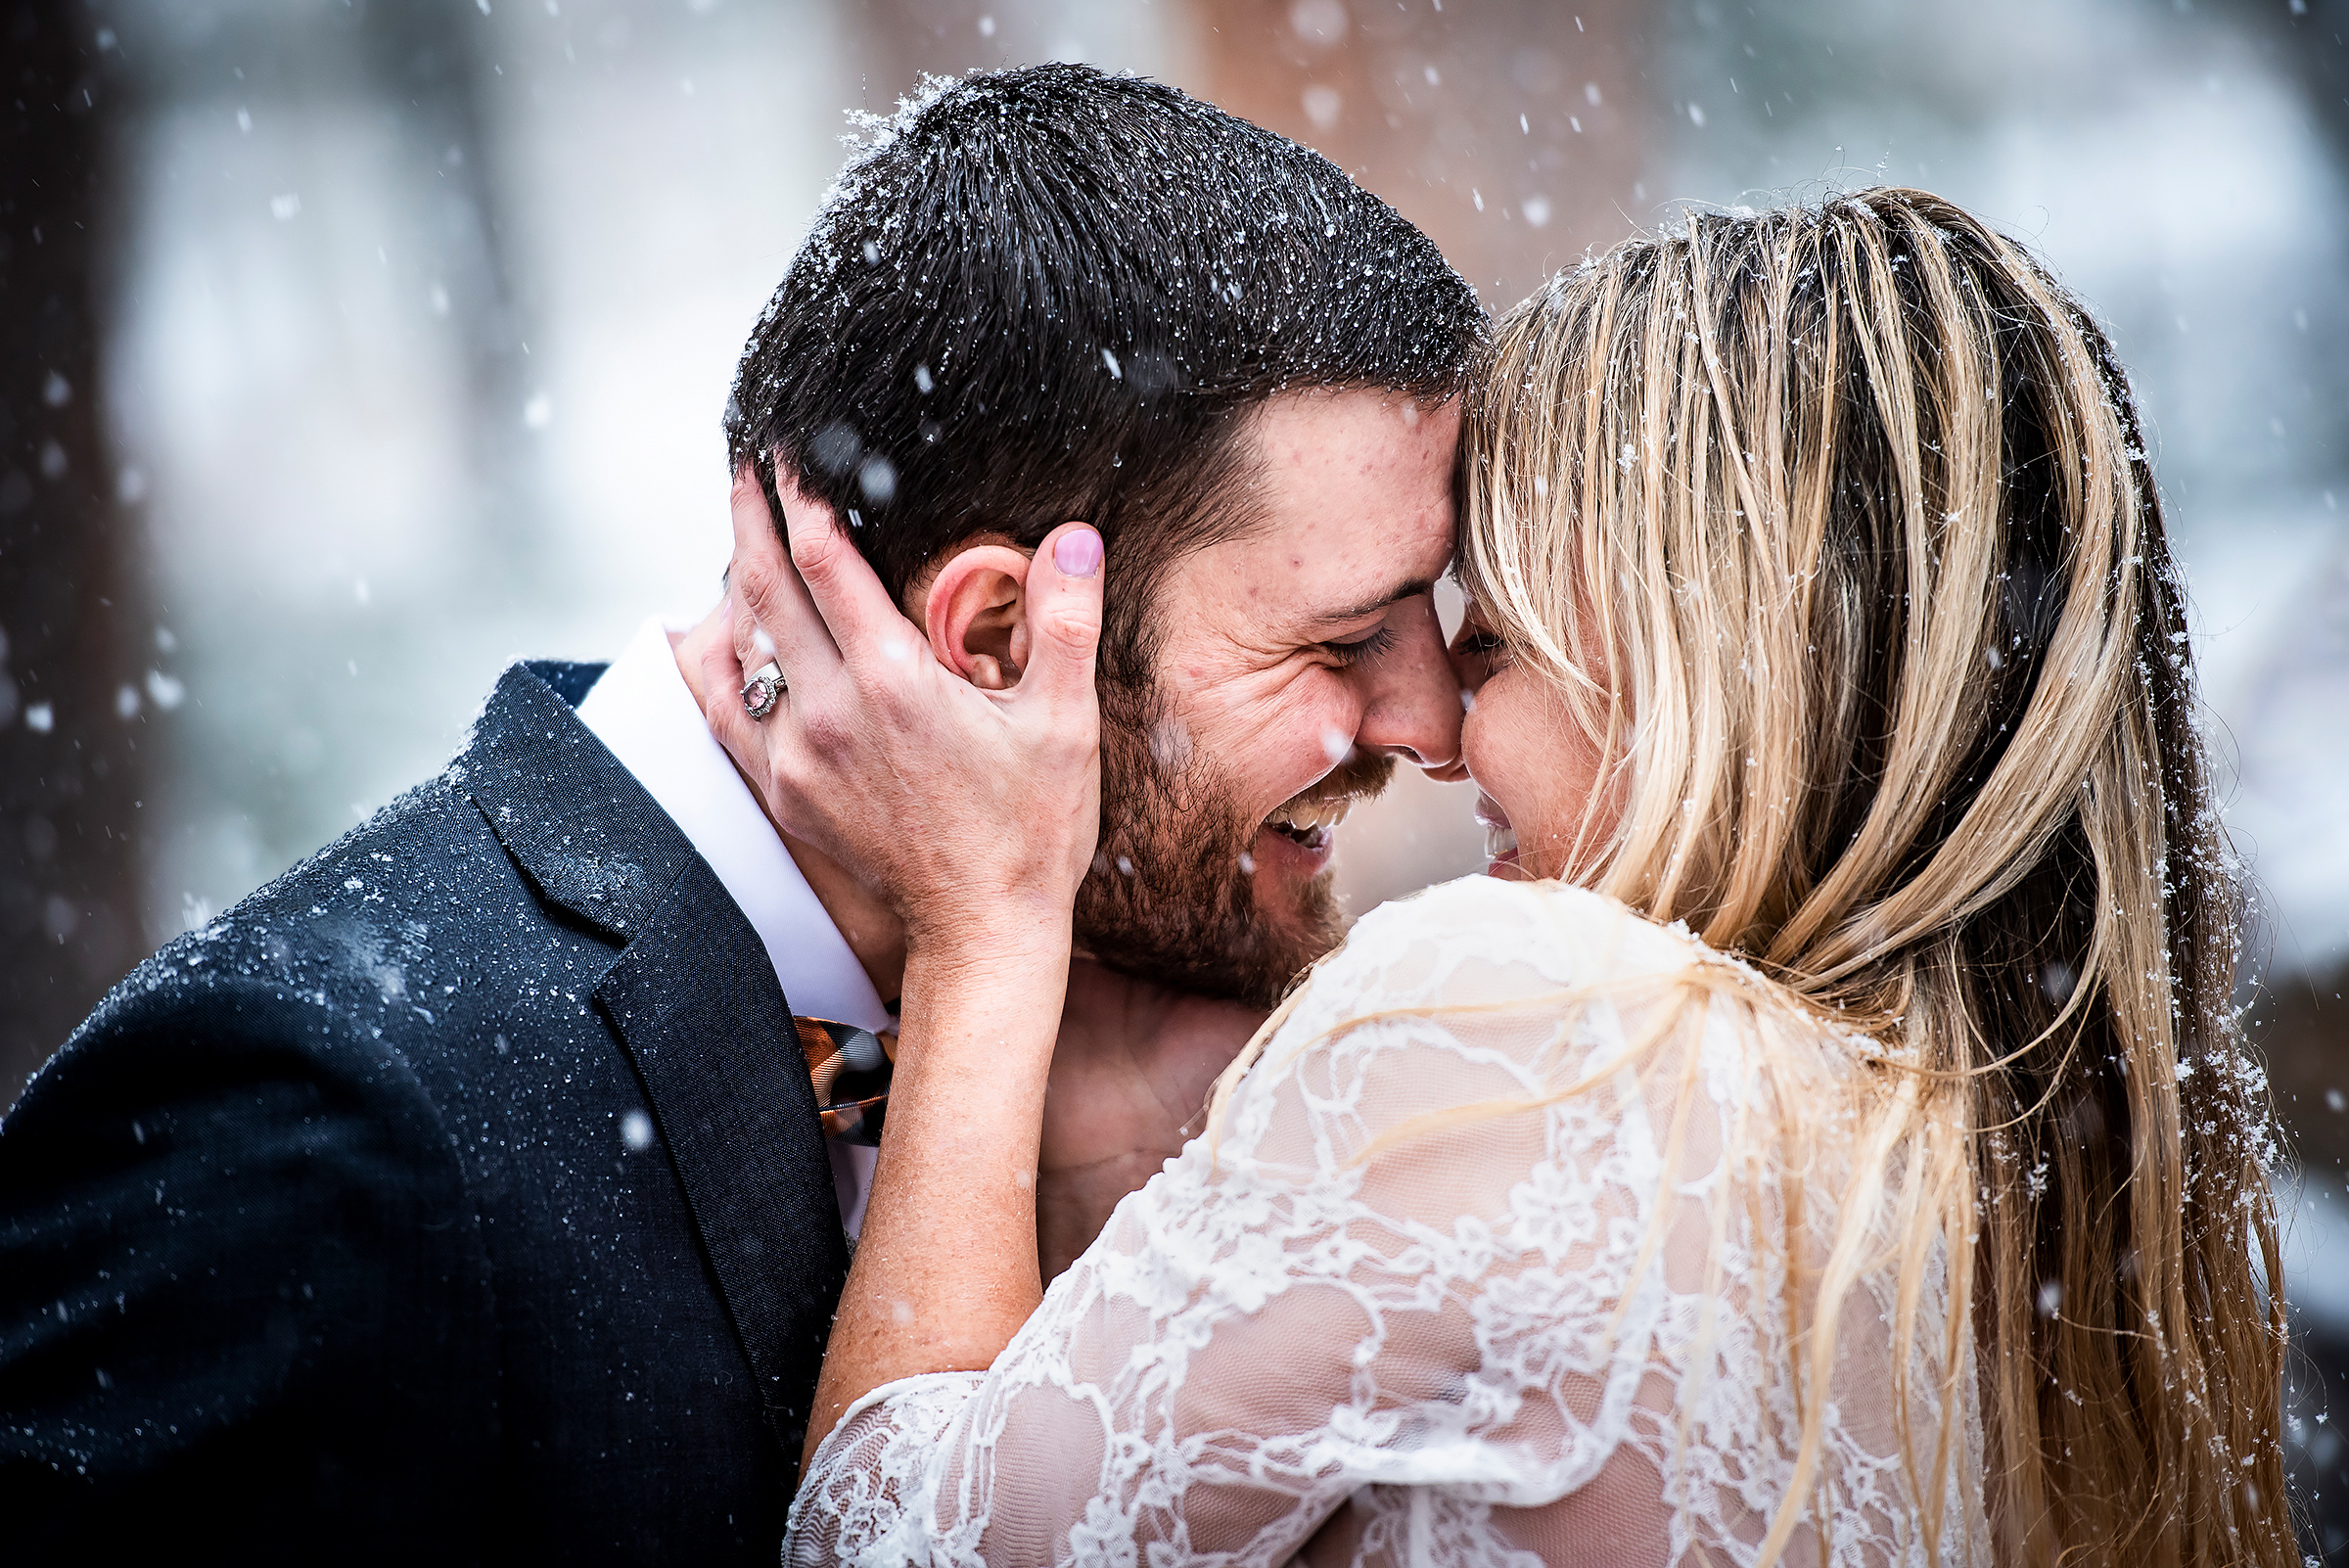 face-to-face-couple-in-falling-snow-j-la-plante-photo